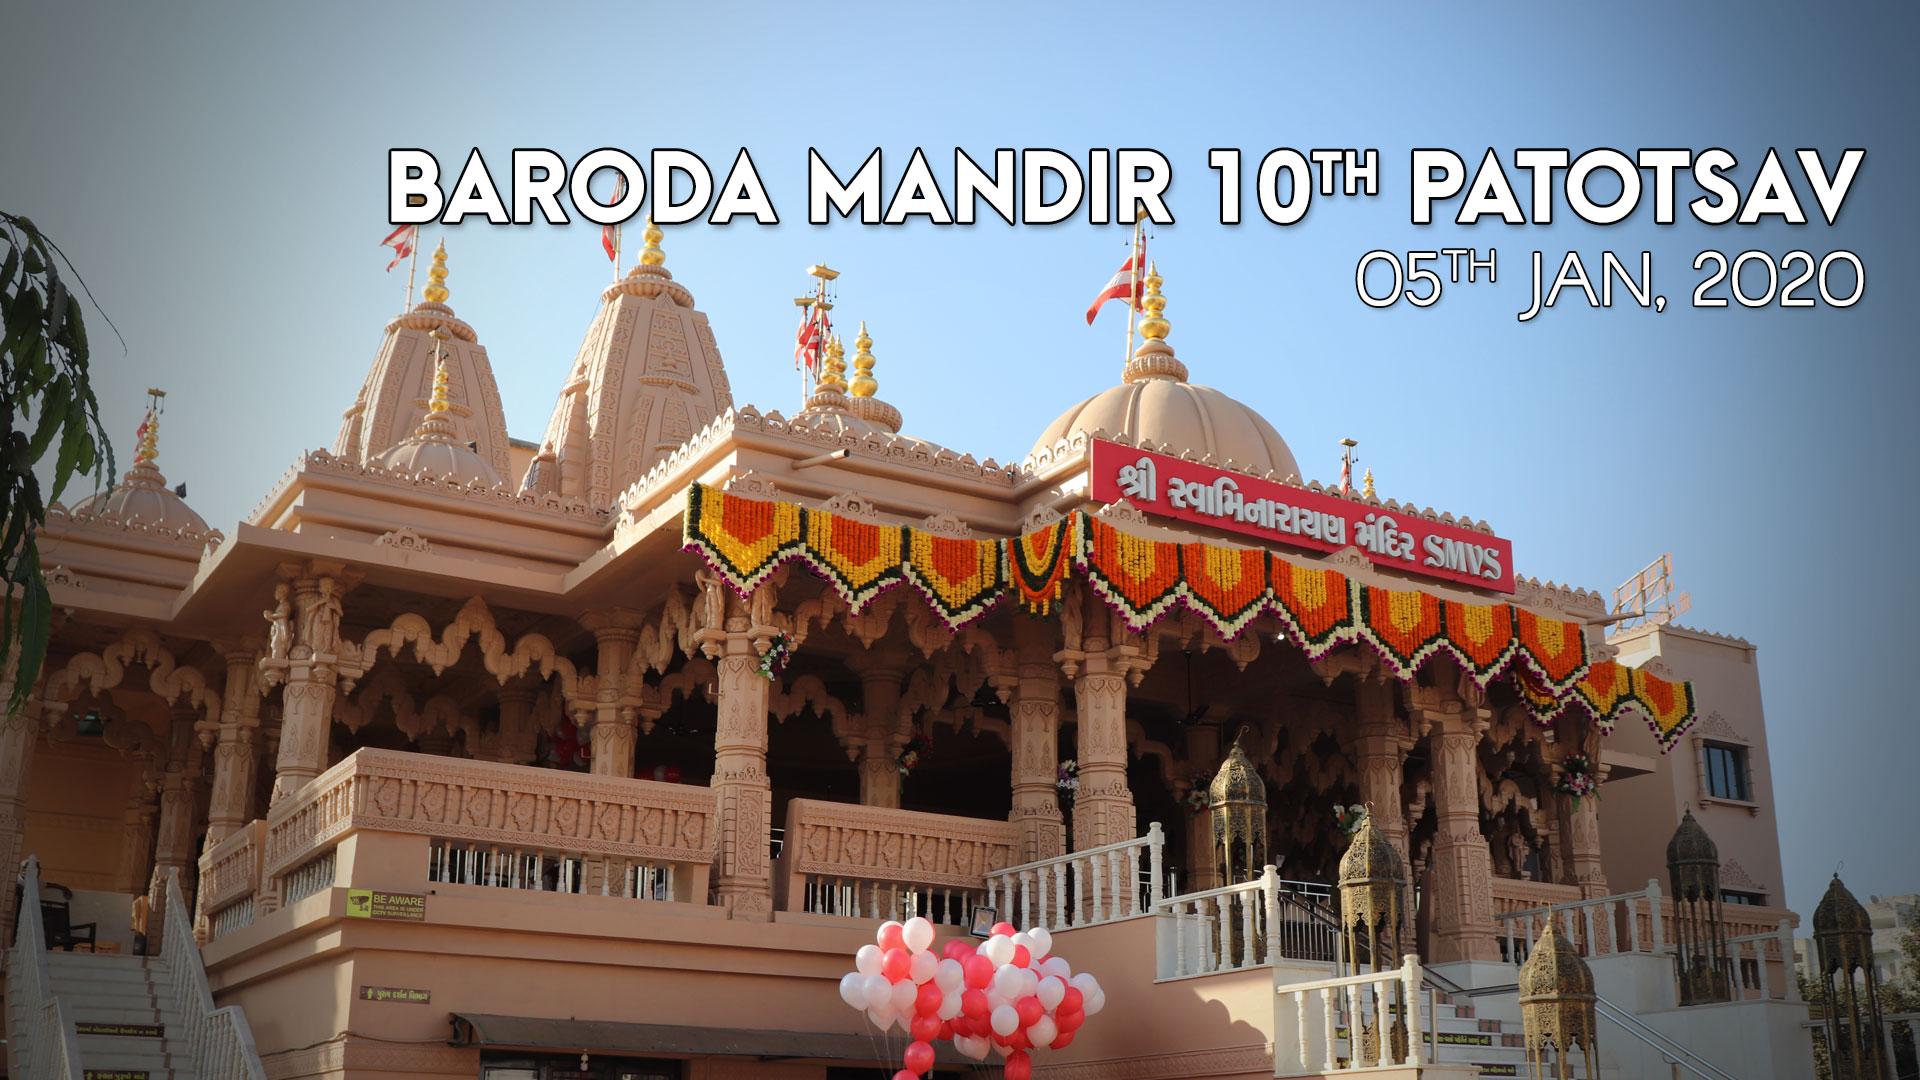 SMVS Swaminarayan Mandir 10th Patotsav | Baroda